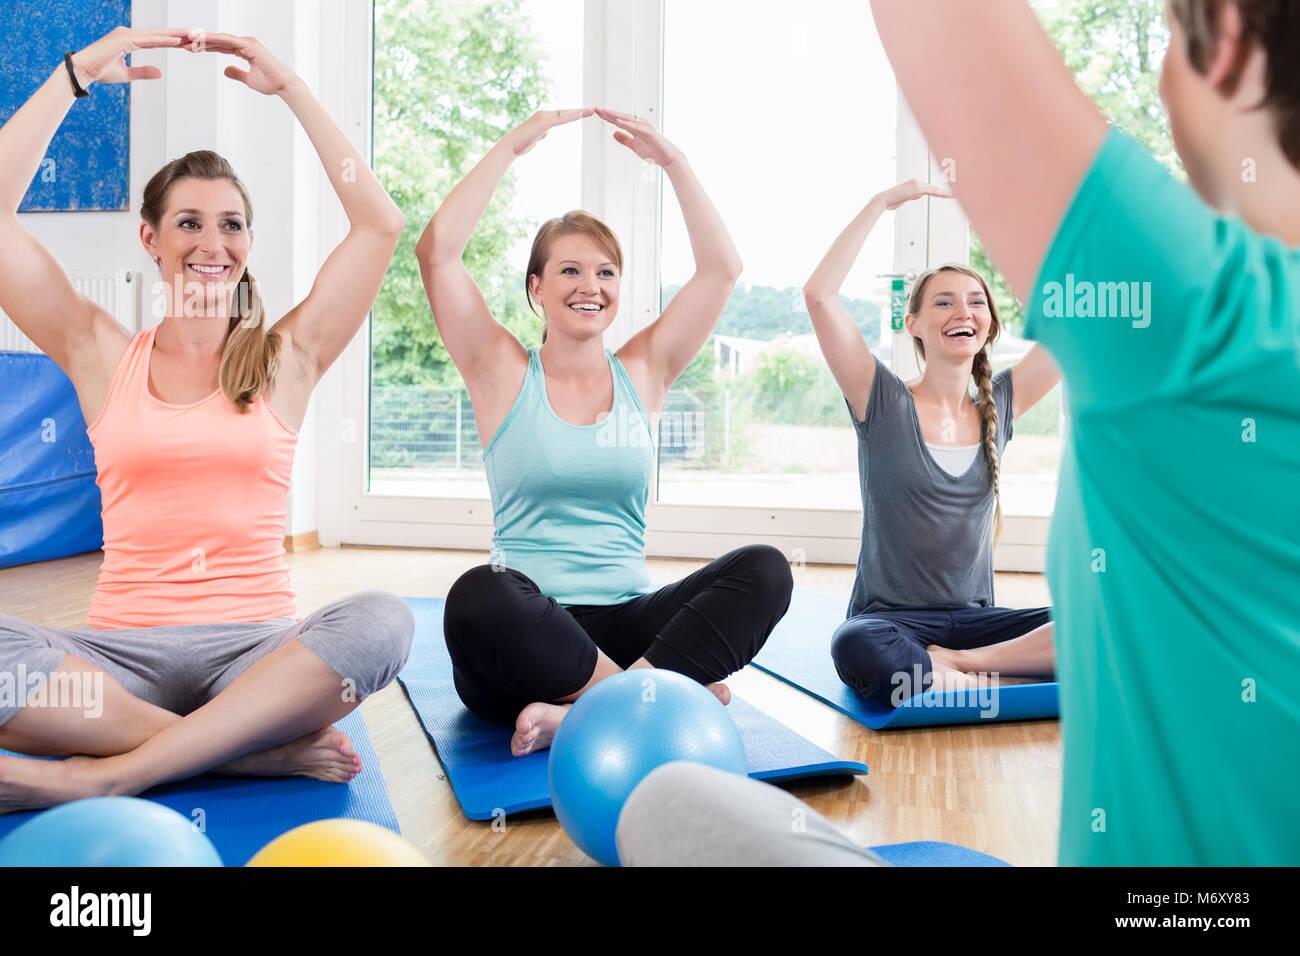 Moms in postnatal regression course doing yoga - Stock Image